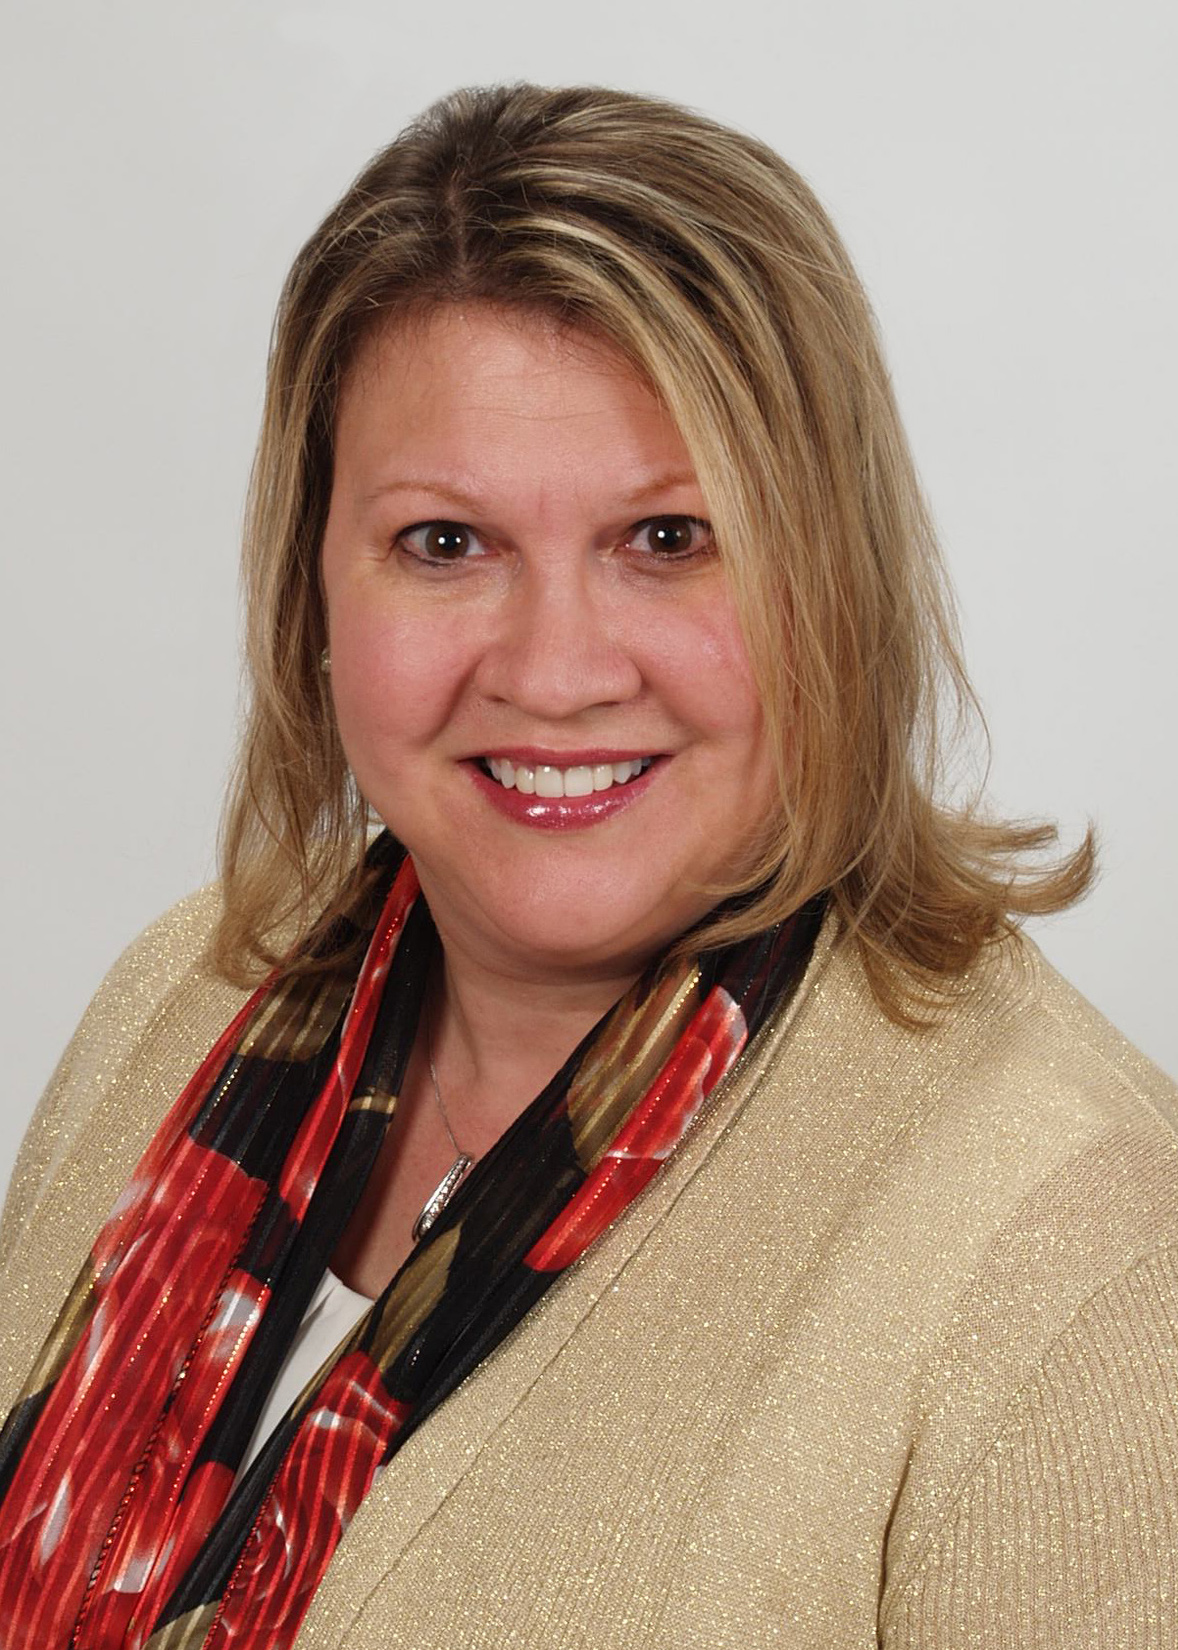 Renee Klivickis Melville